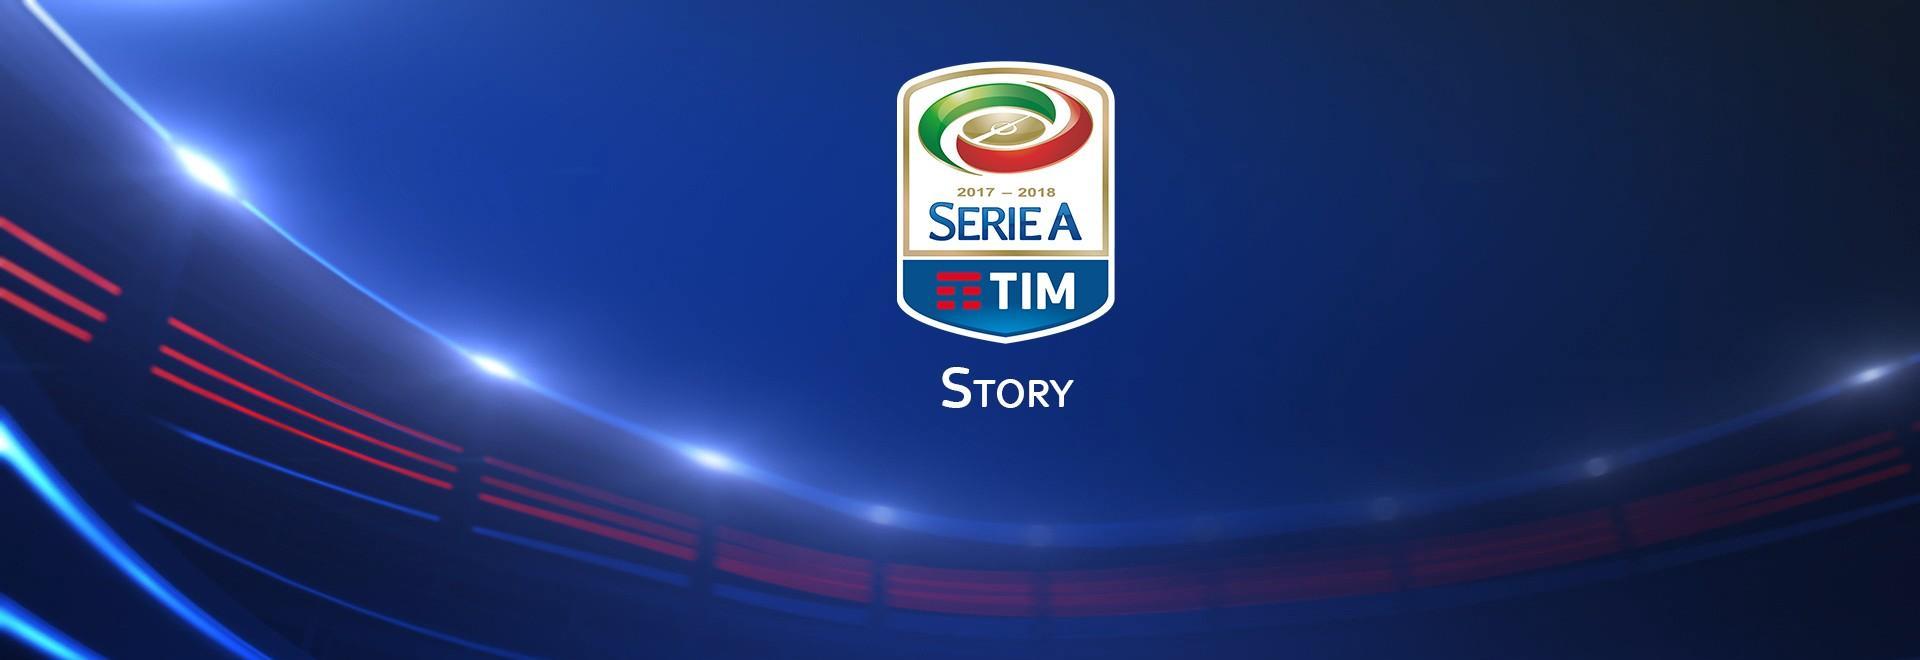 Napoli - Juventus 02/04/17